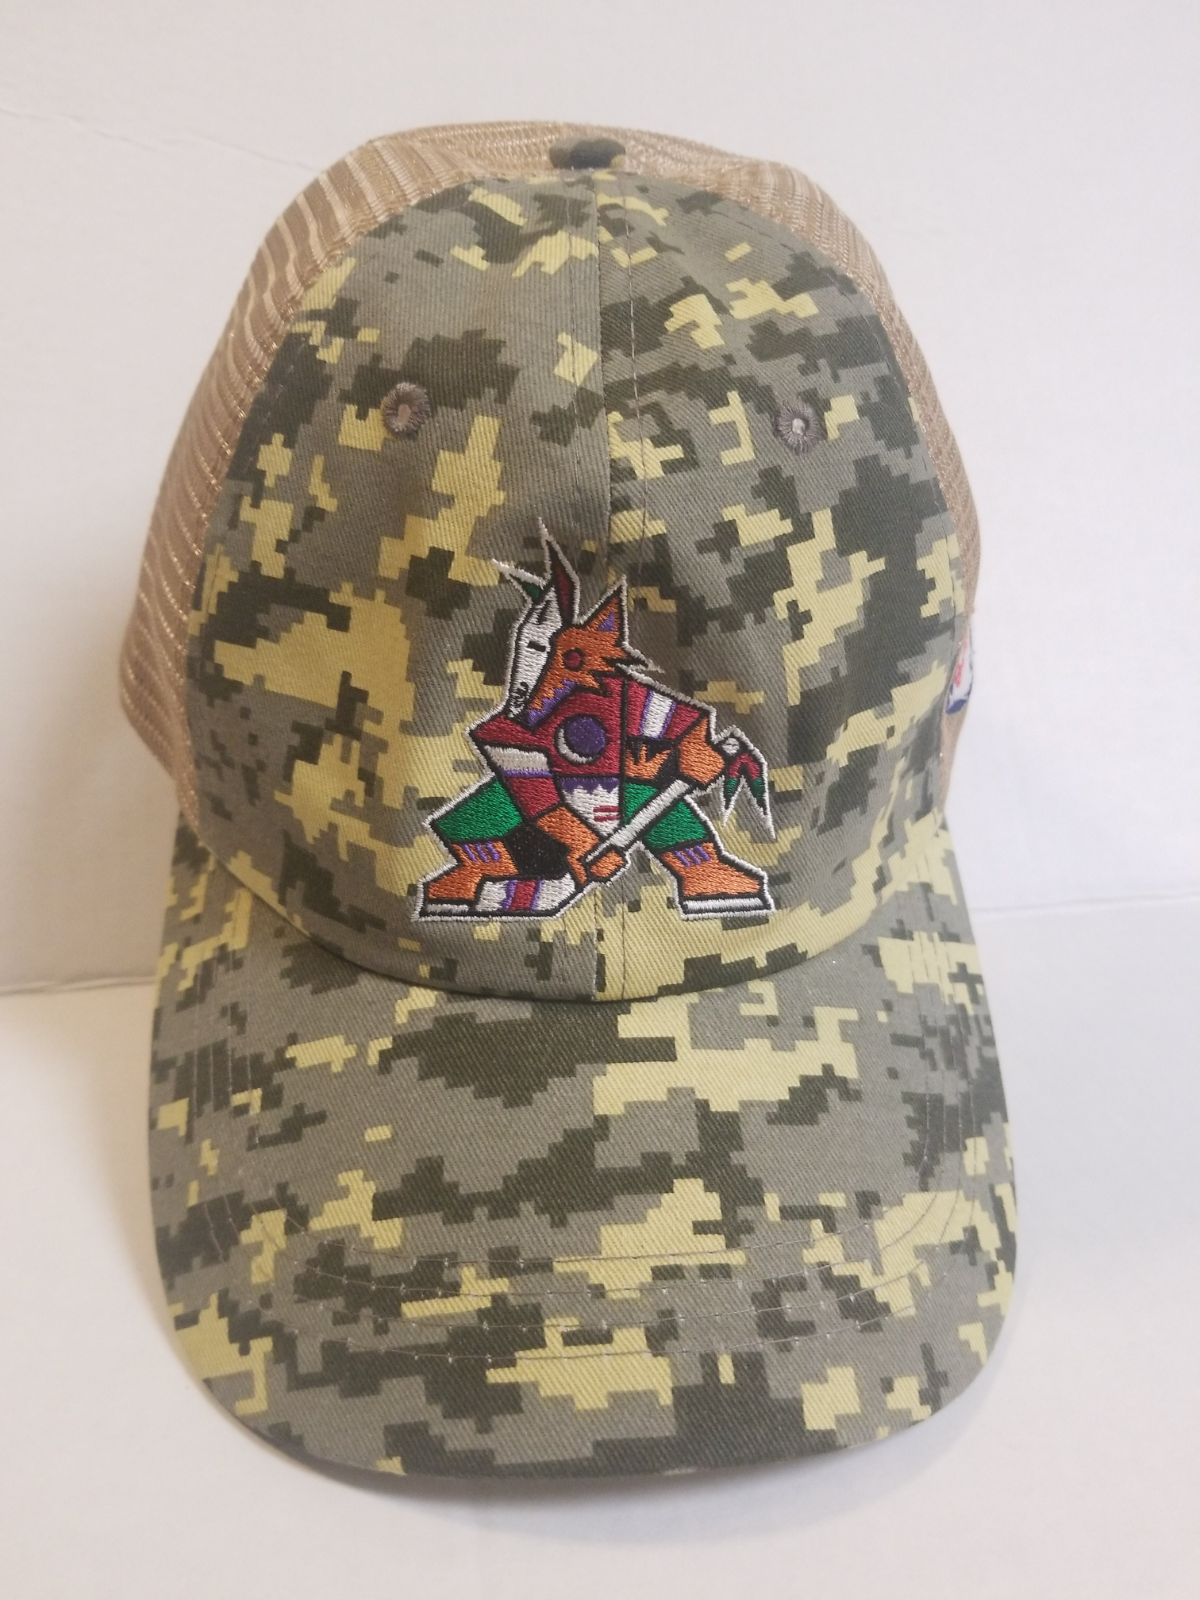 Phoenix Coyotes vintage logo camo hat